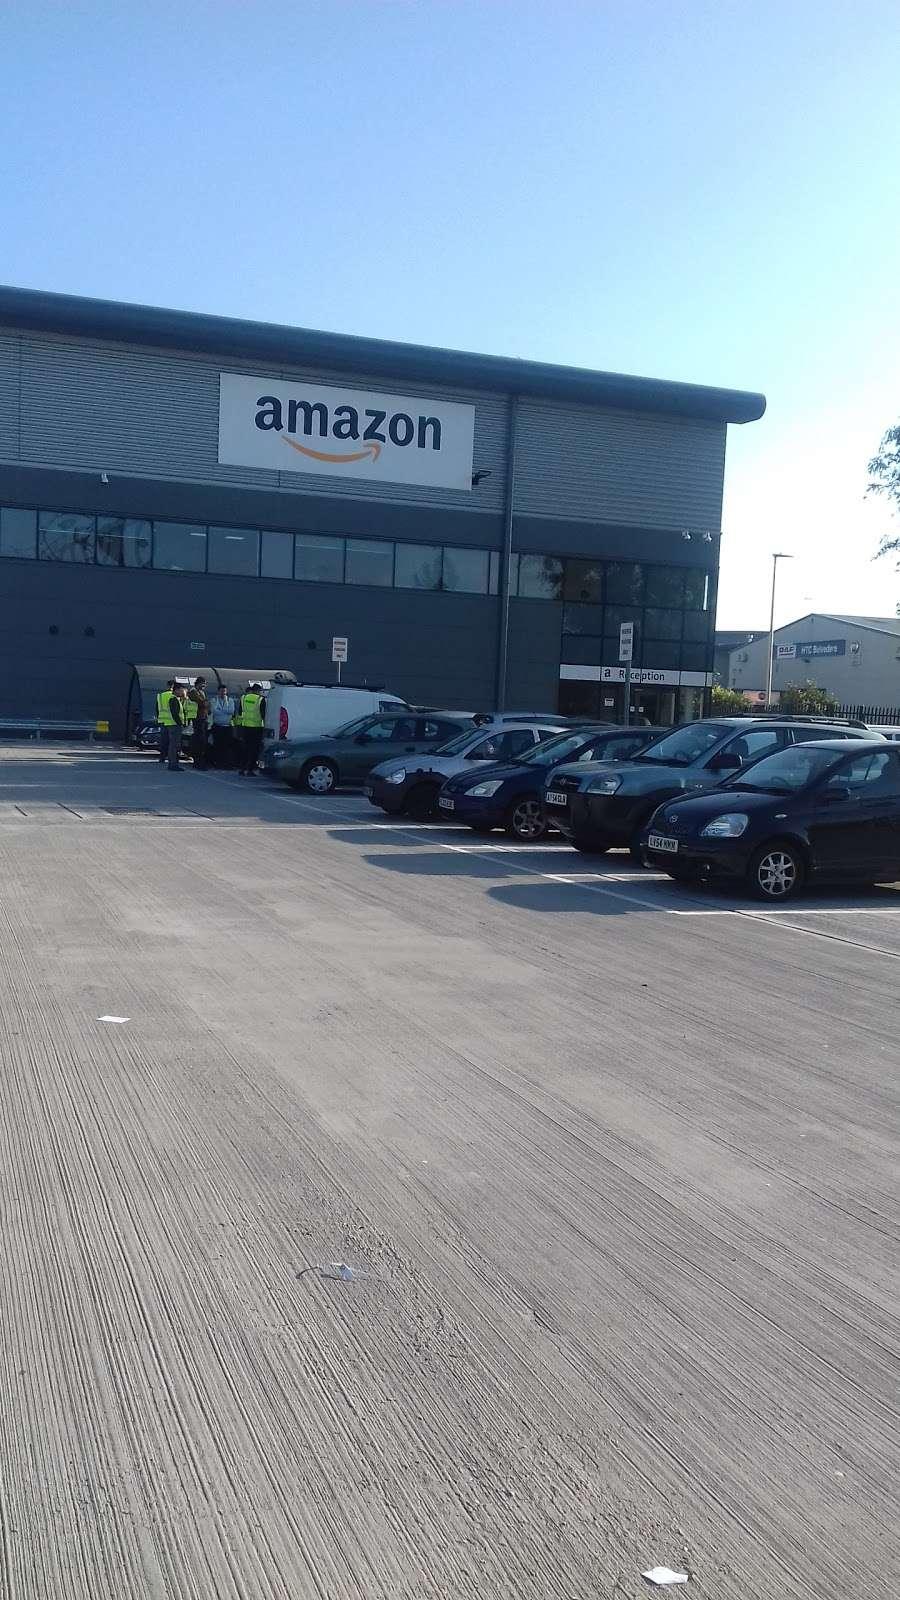 DBR1 Amazon Warehouse - storage    Photo 5 of 10   Address: 7 Crabtree Manorway N, Belvedere DA17 6AS, UK   Phone: 07468 087576